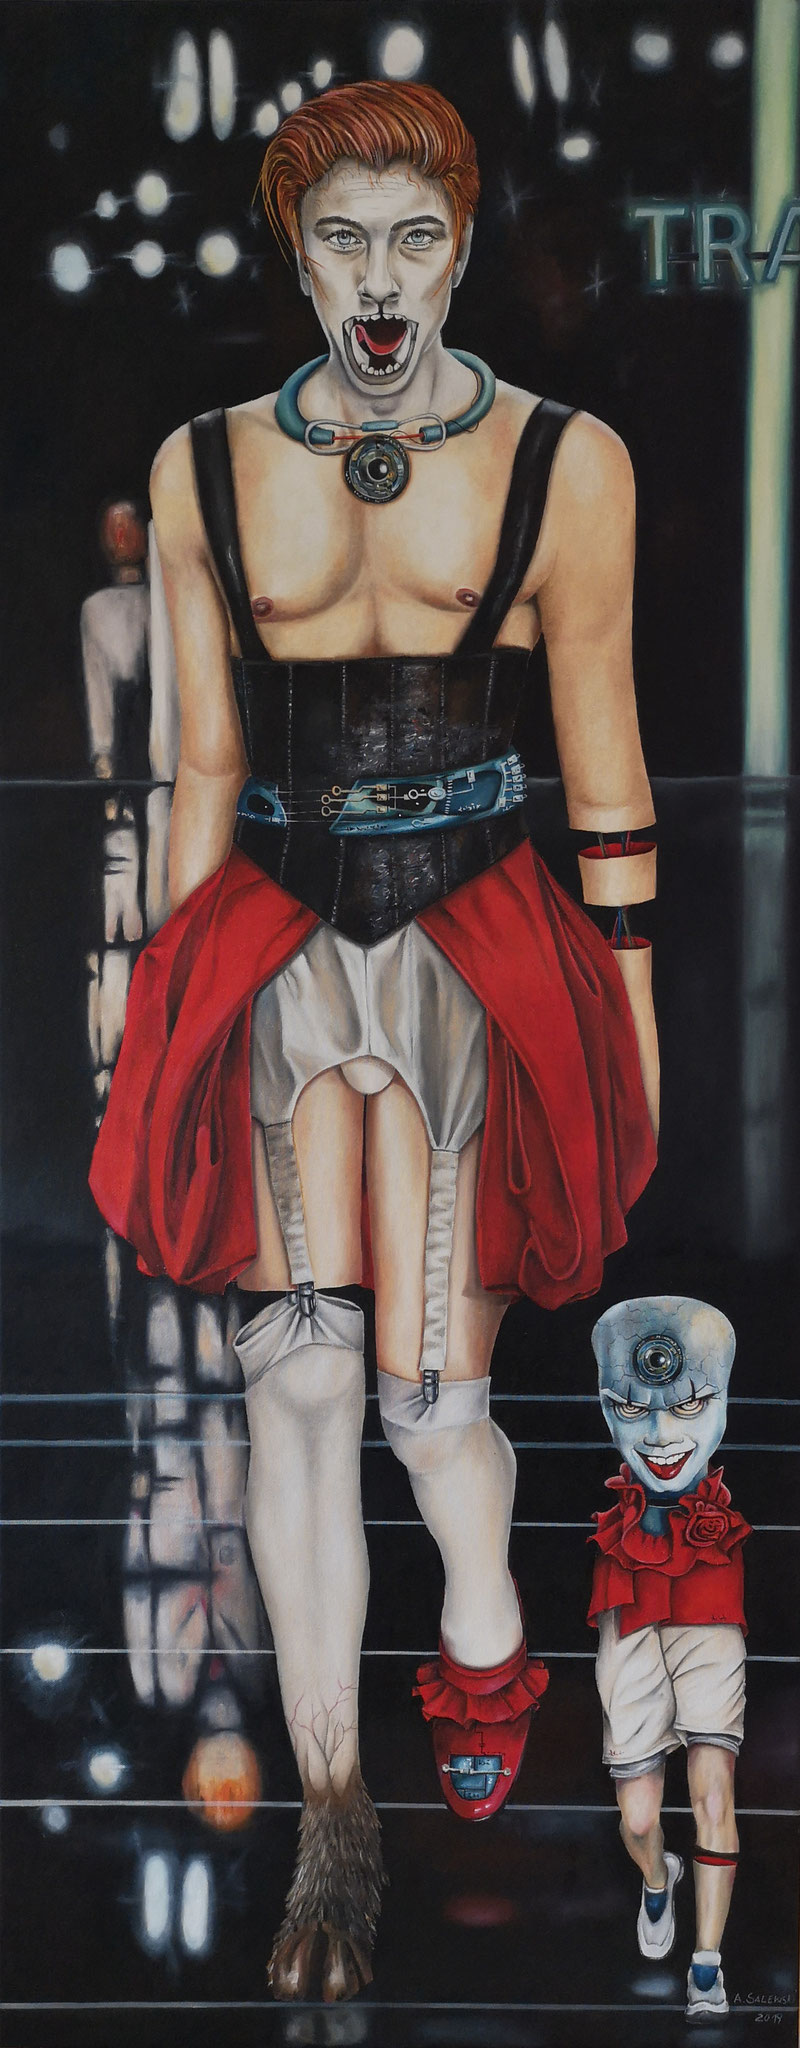 """It's Fashion II"" | 2019 | Öl auf Leinwand | 150x60 cm"